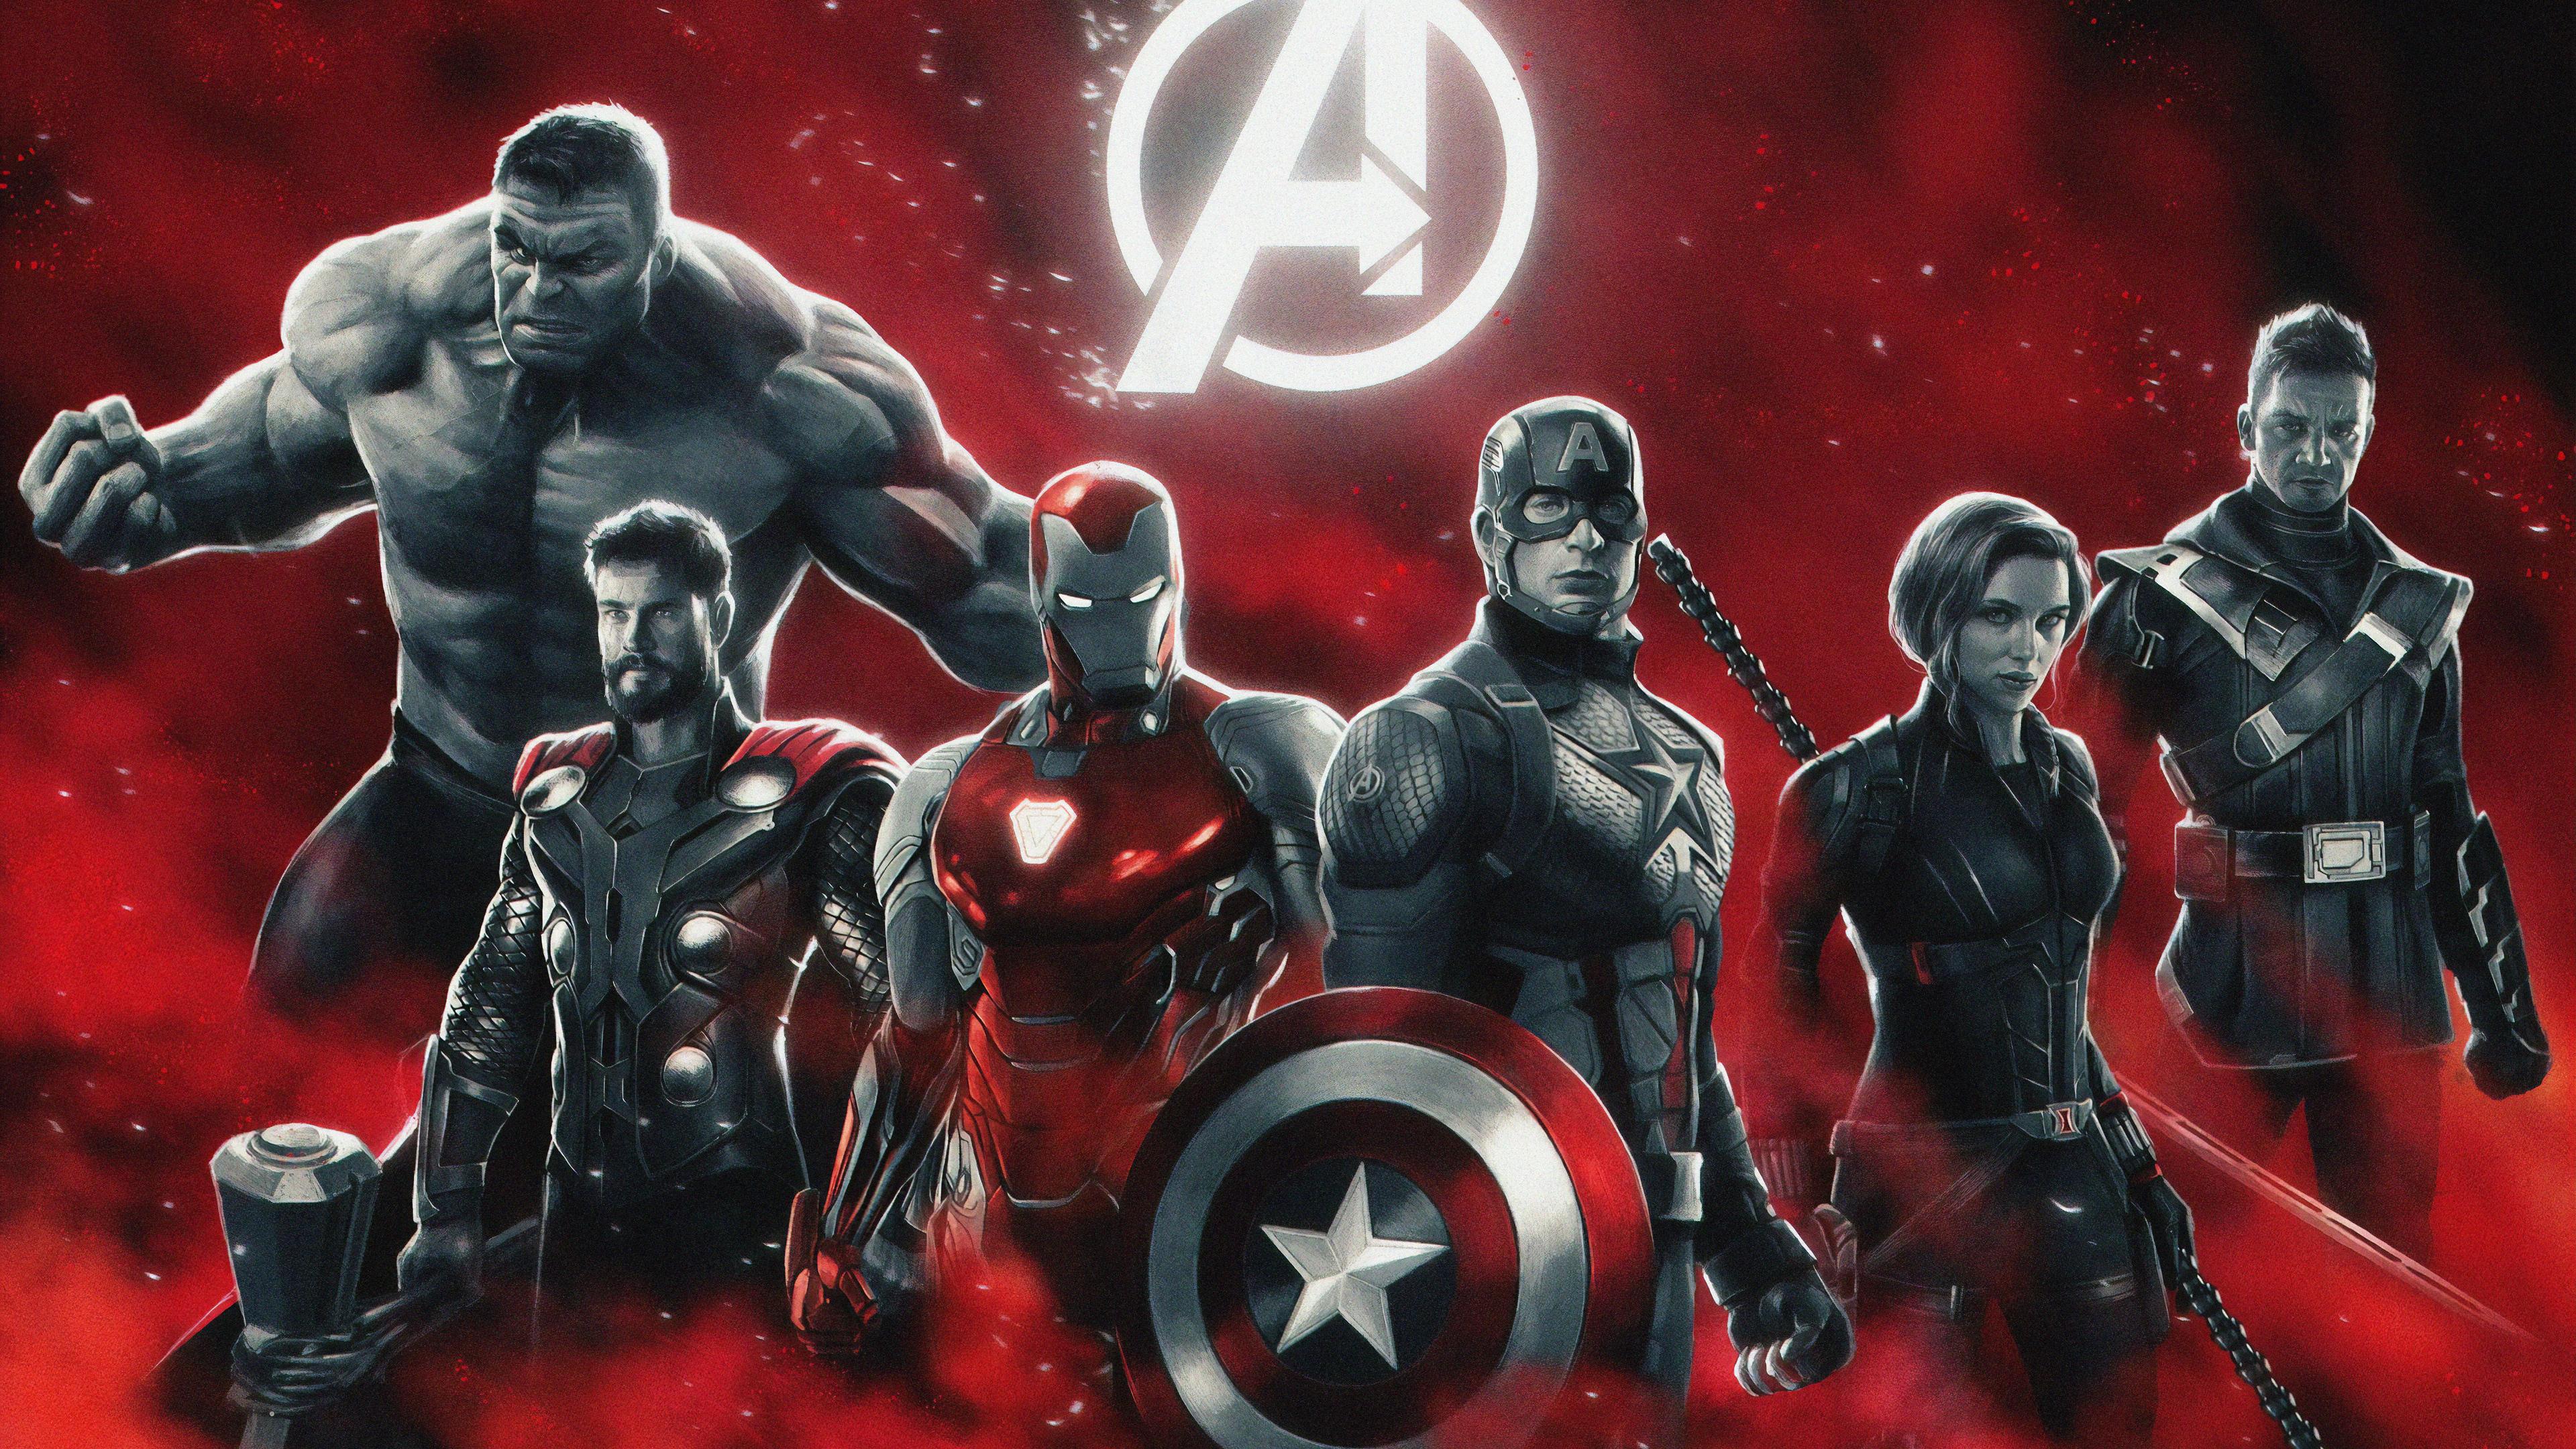 avengers endgame artwork 1563220408 - Avengers Endgame Artwork - thor wallpapers, superheroes wallpapers, hd-wallpapers, avengers endgame wallpapers, artwork wallpapers, 4k-wallpapers